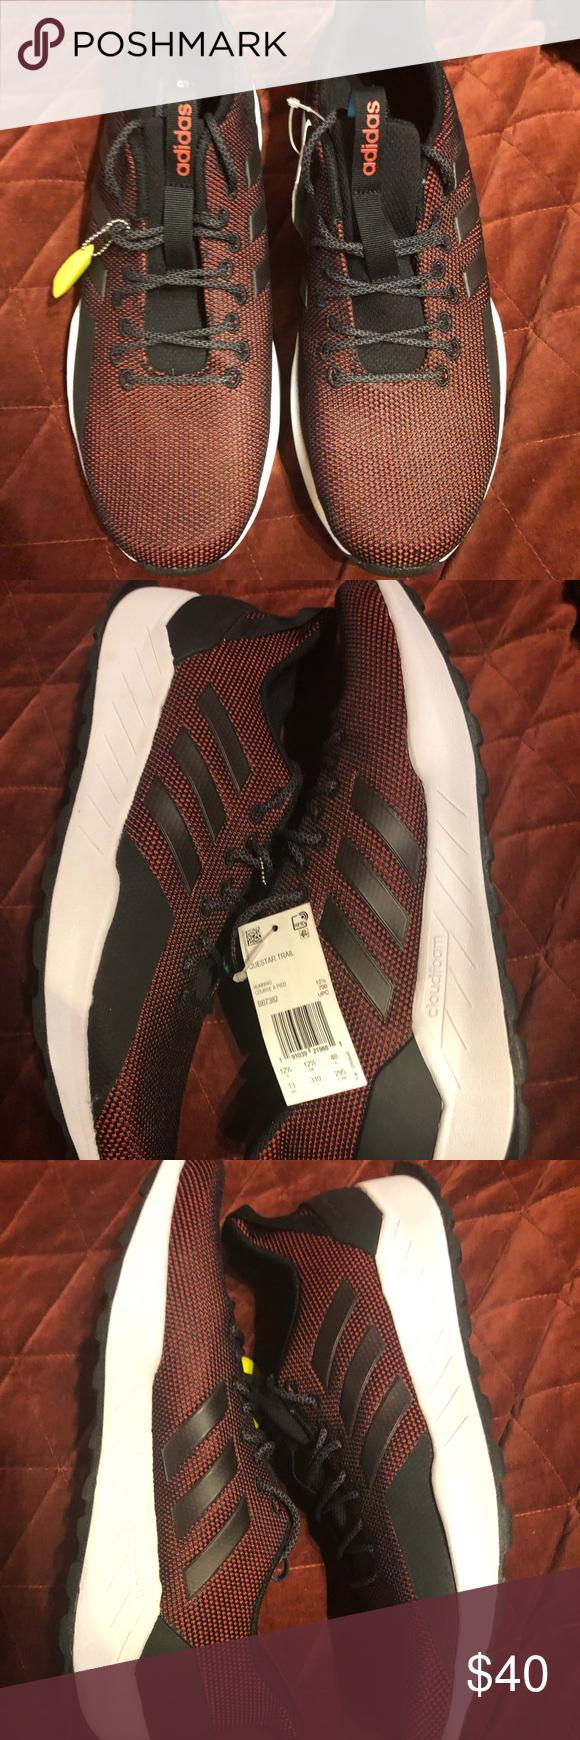 Adidas Questar Trail BB7382 Men's Size